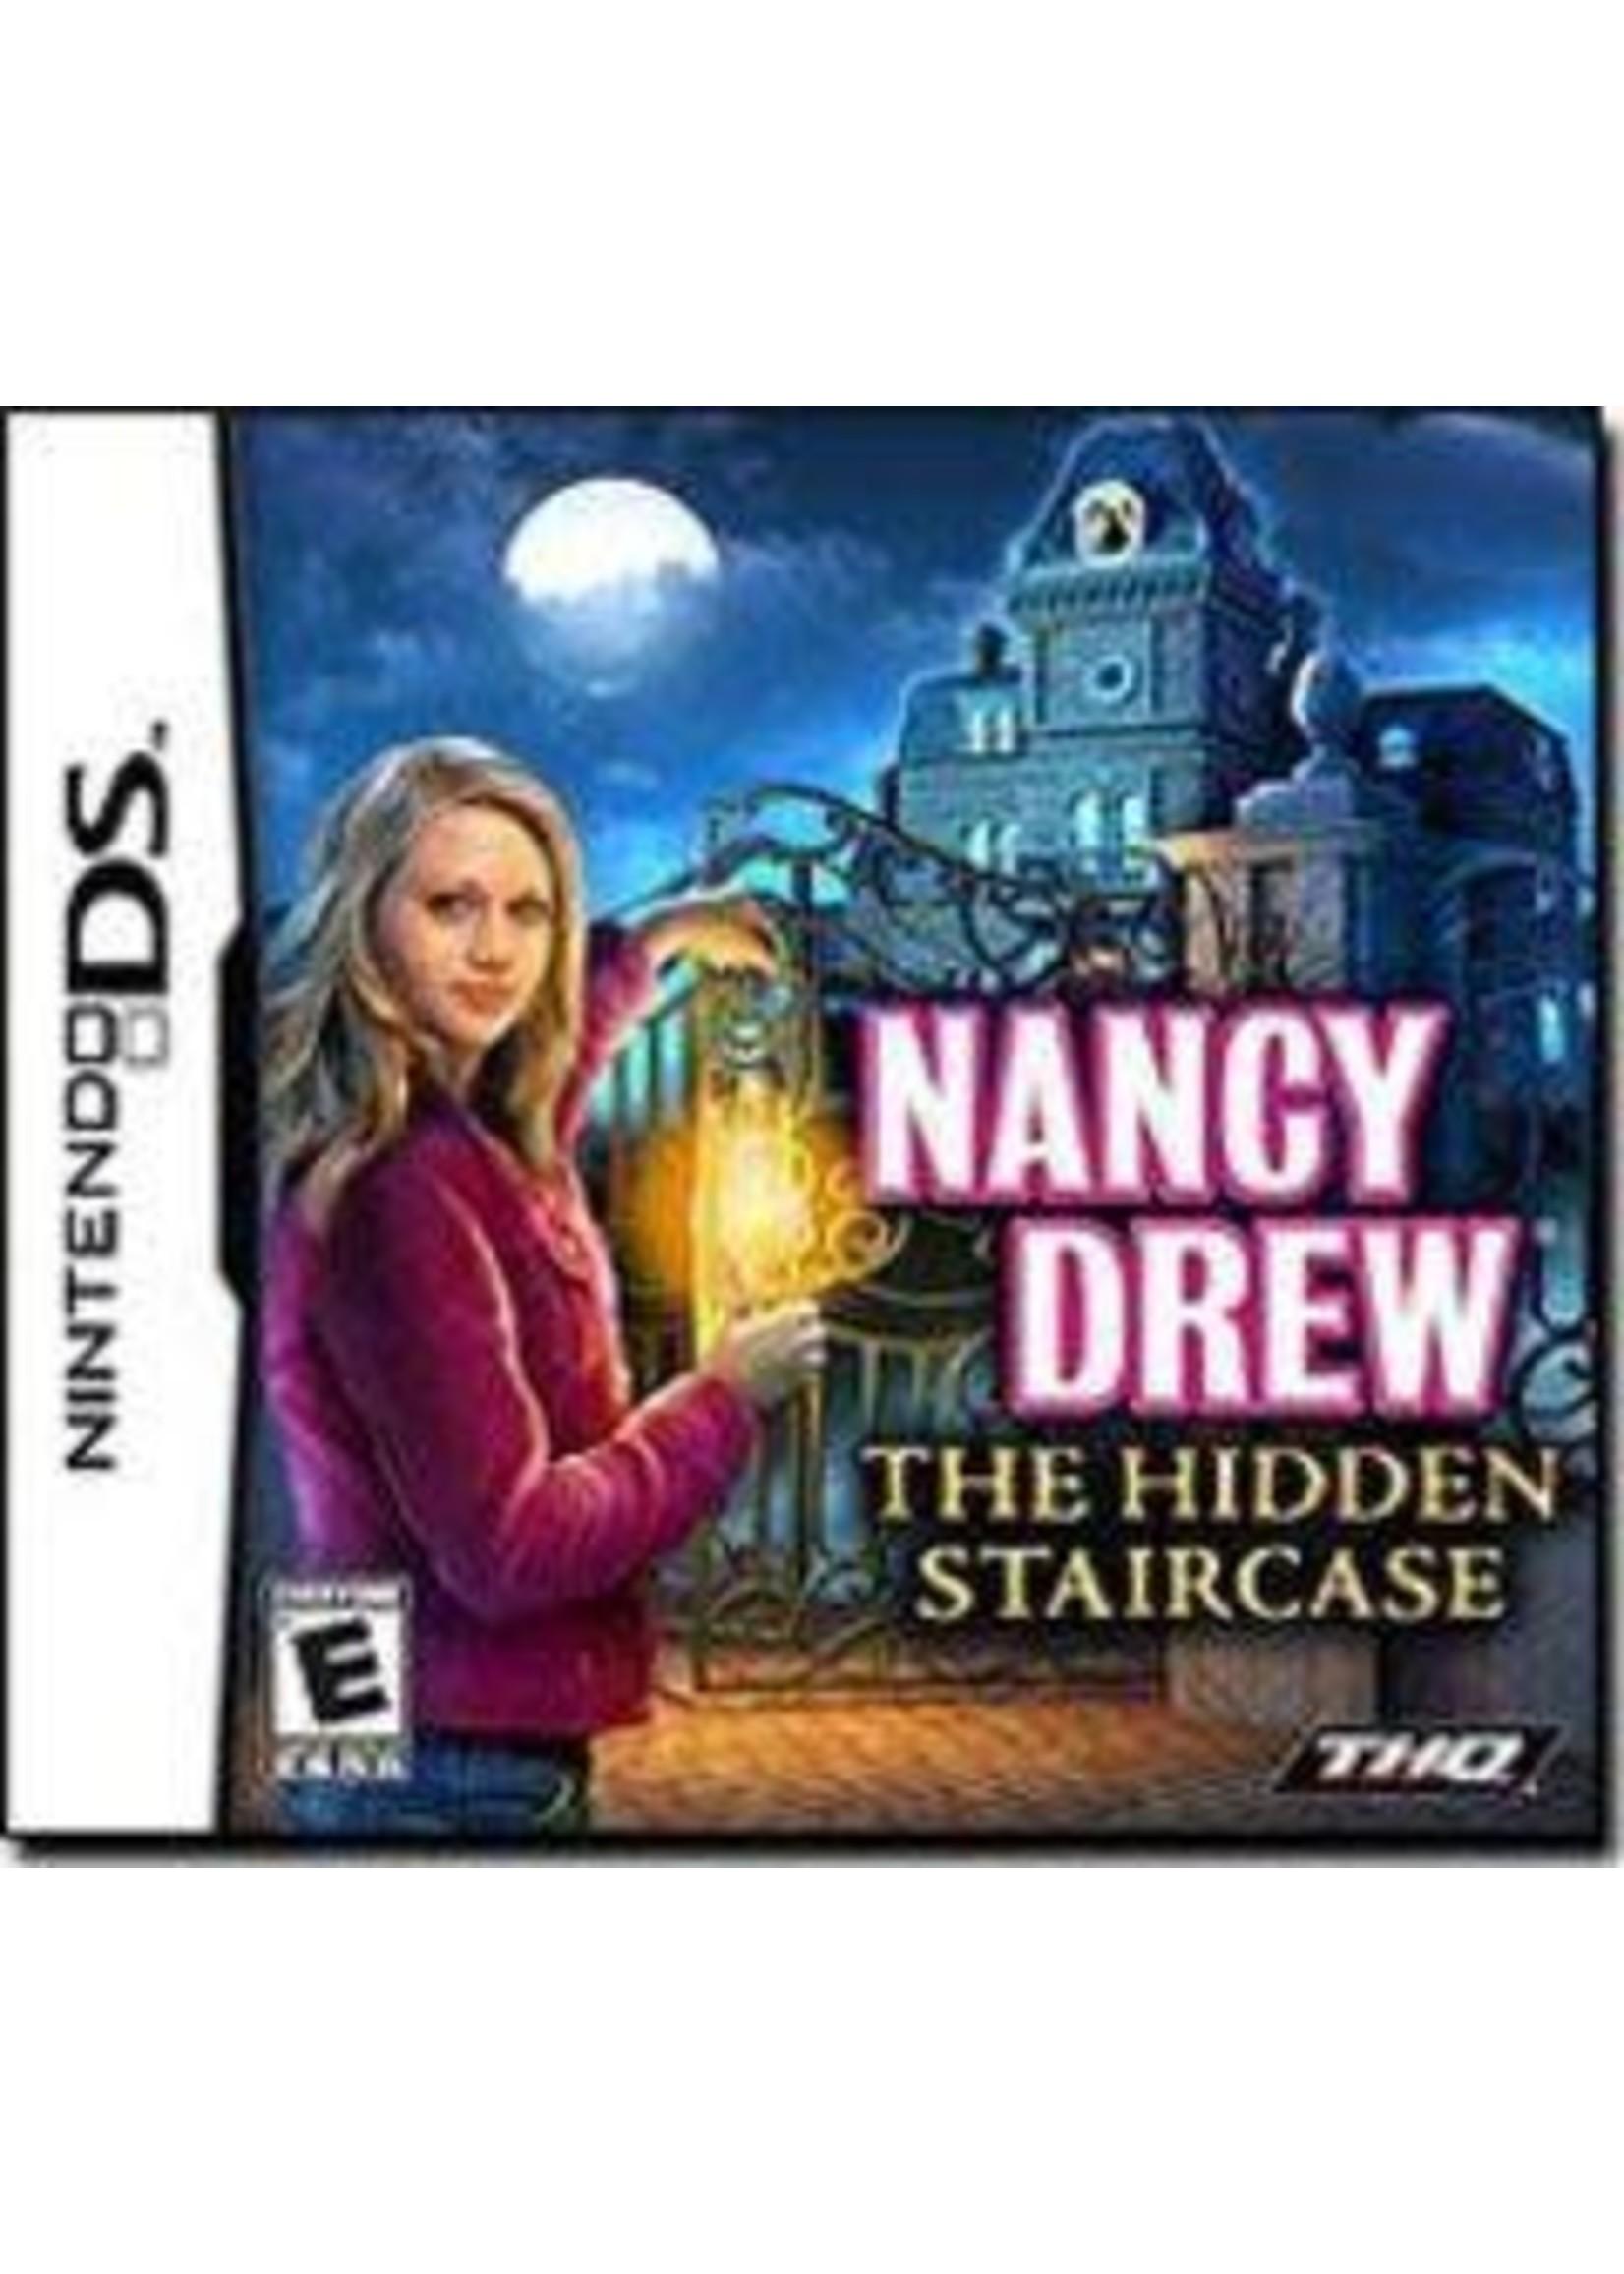 Nancy Drew The Hidden Staircase Nintendo DS